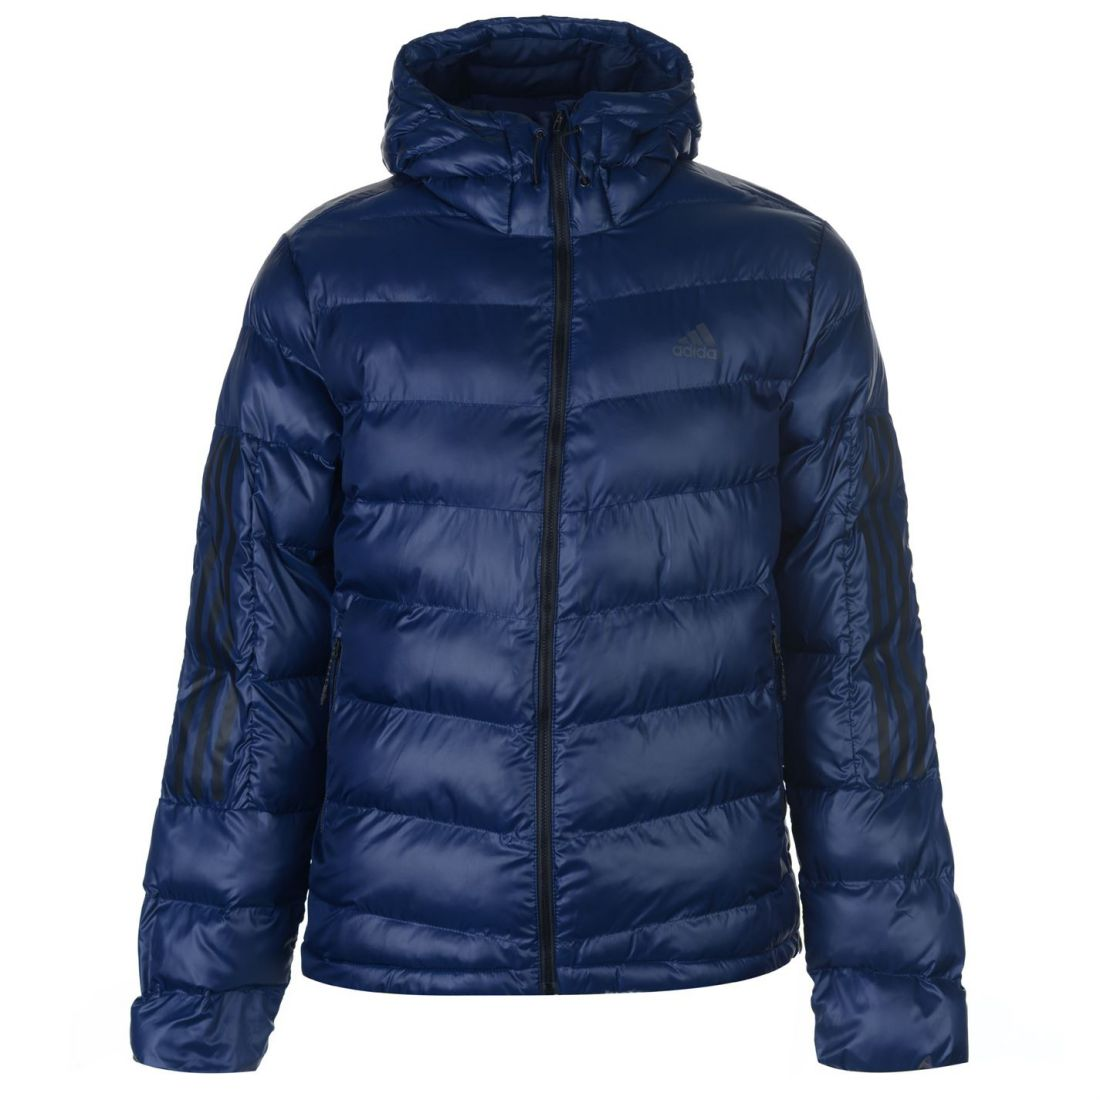 adidas Mens Itavic 3 Stripe Jacket Puffer Coat Top Long Sleeve ... 5075ce522b195